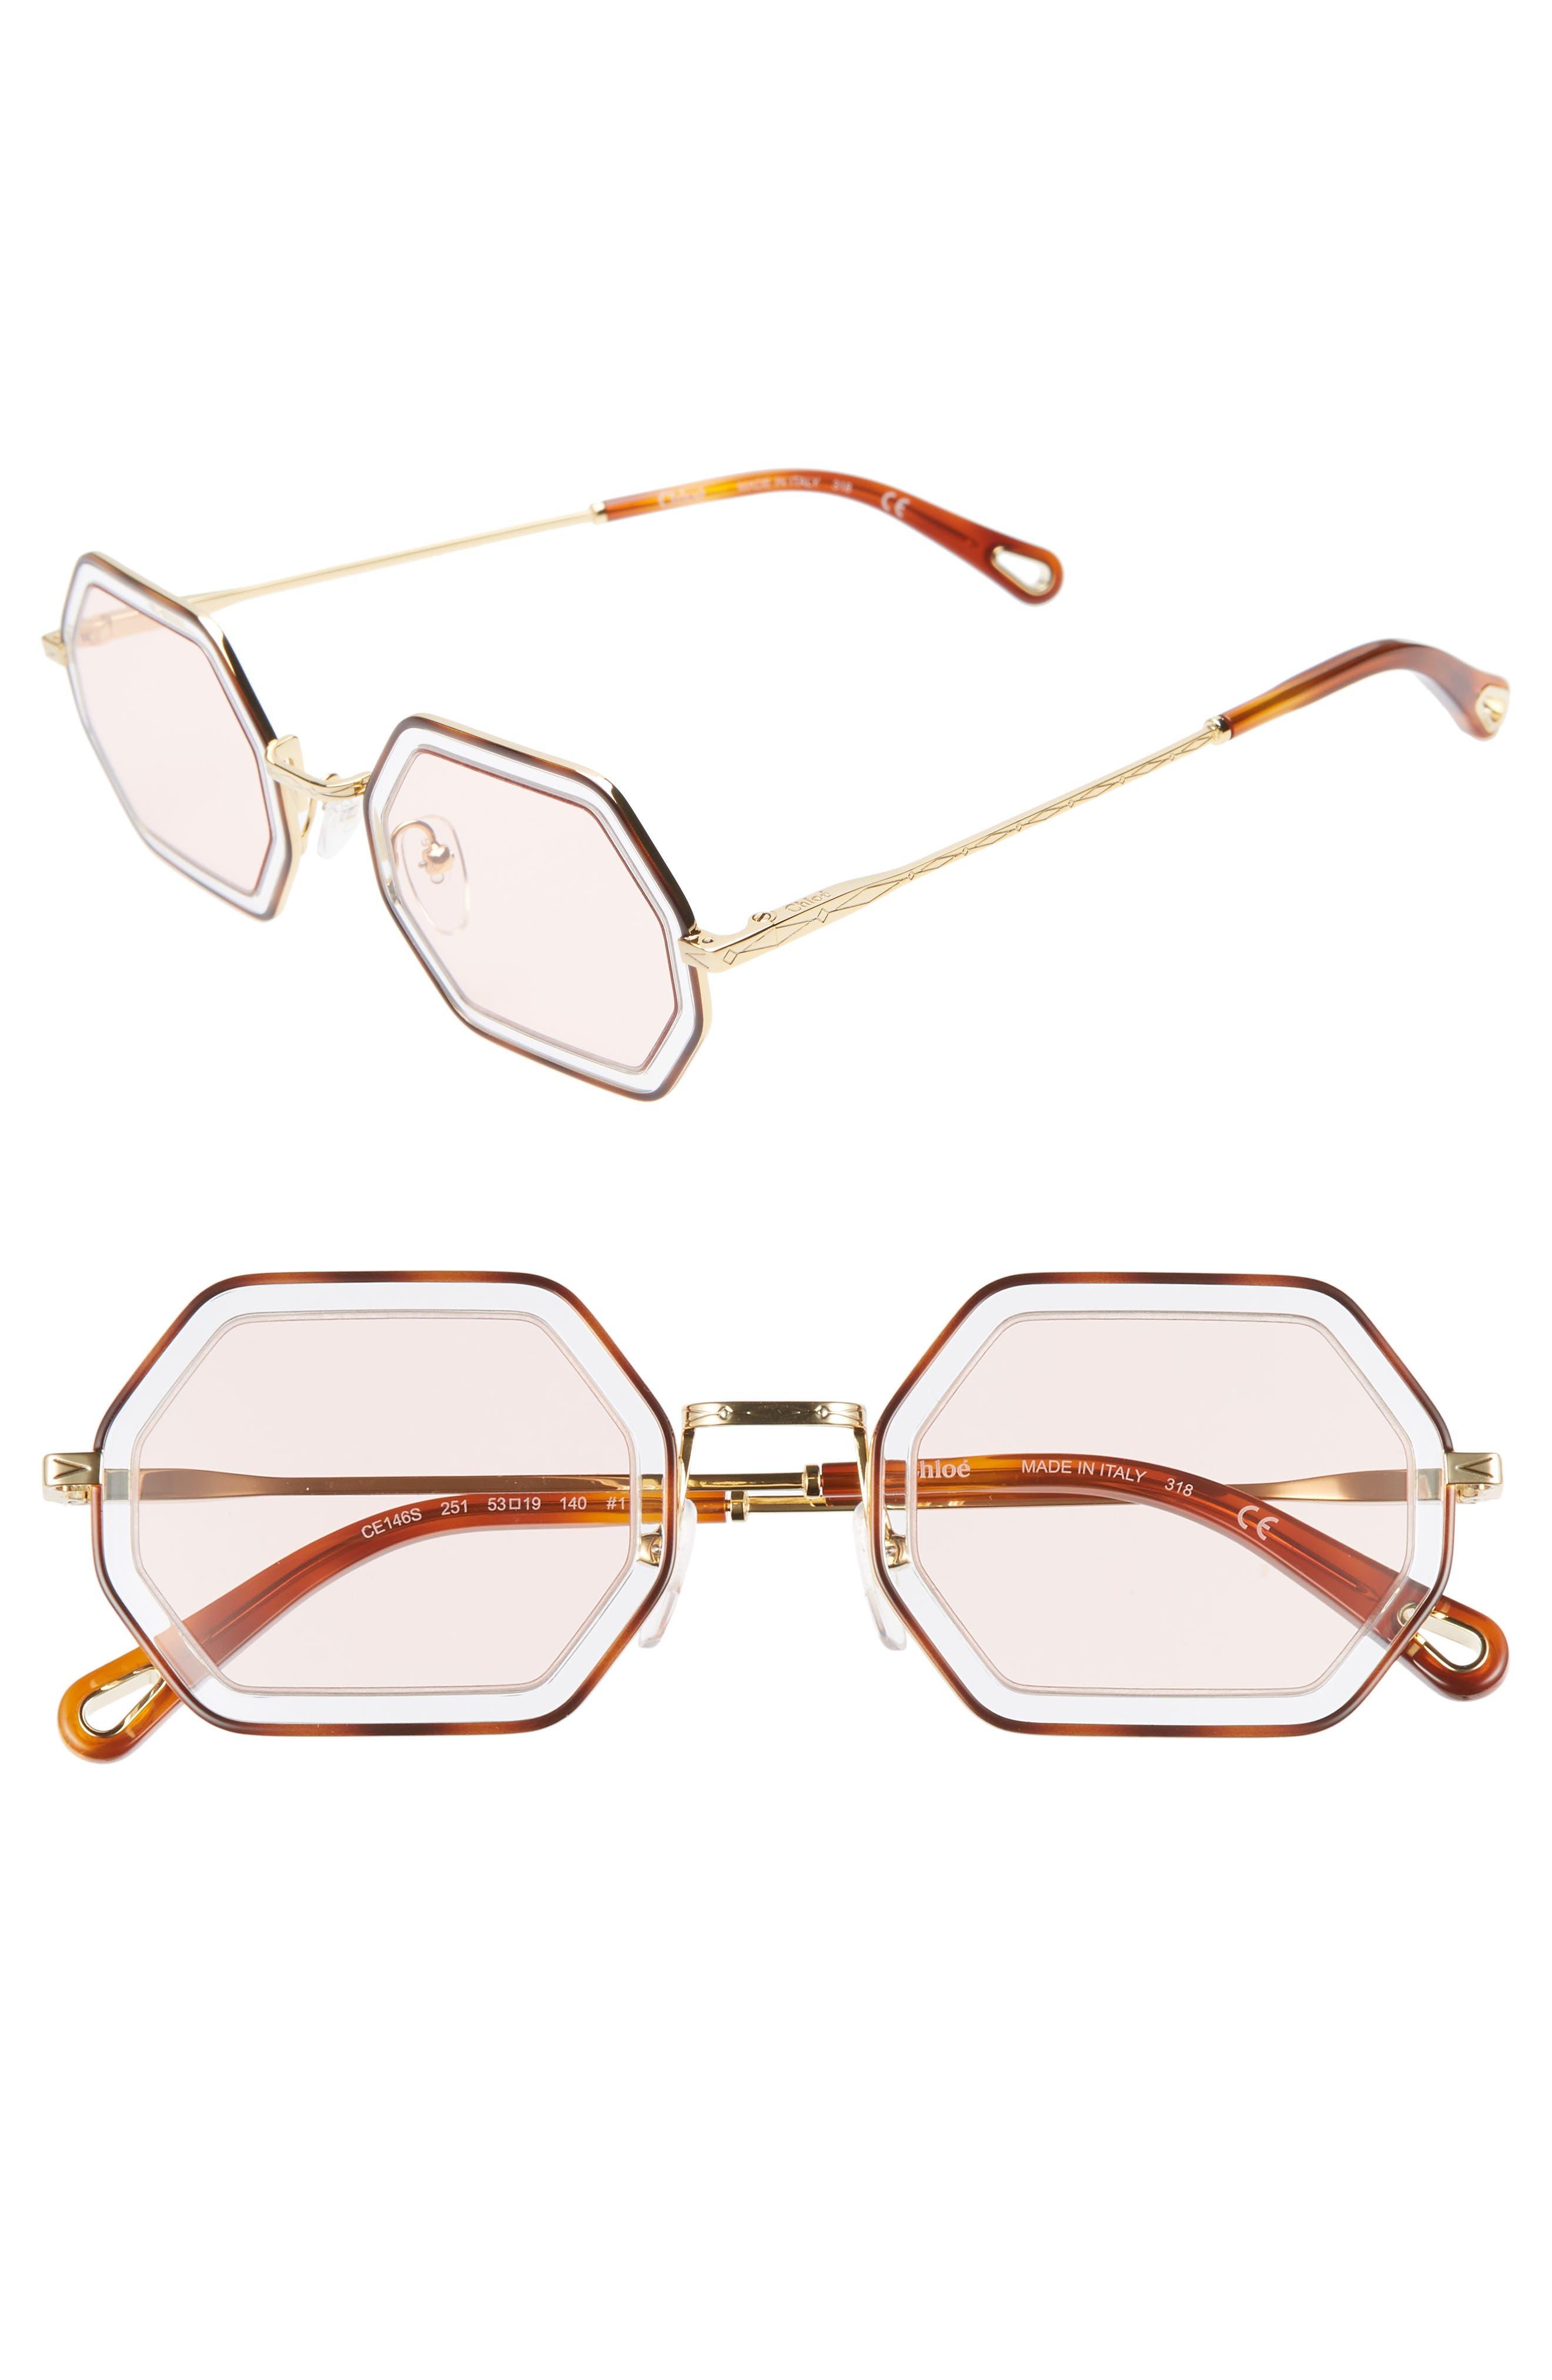 Chloe Tally 5m Octagon Sunglasses - Havana/ Azure/ Pink